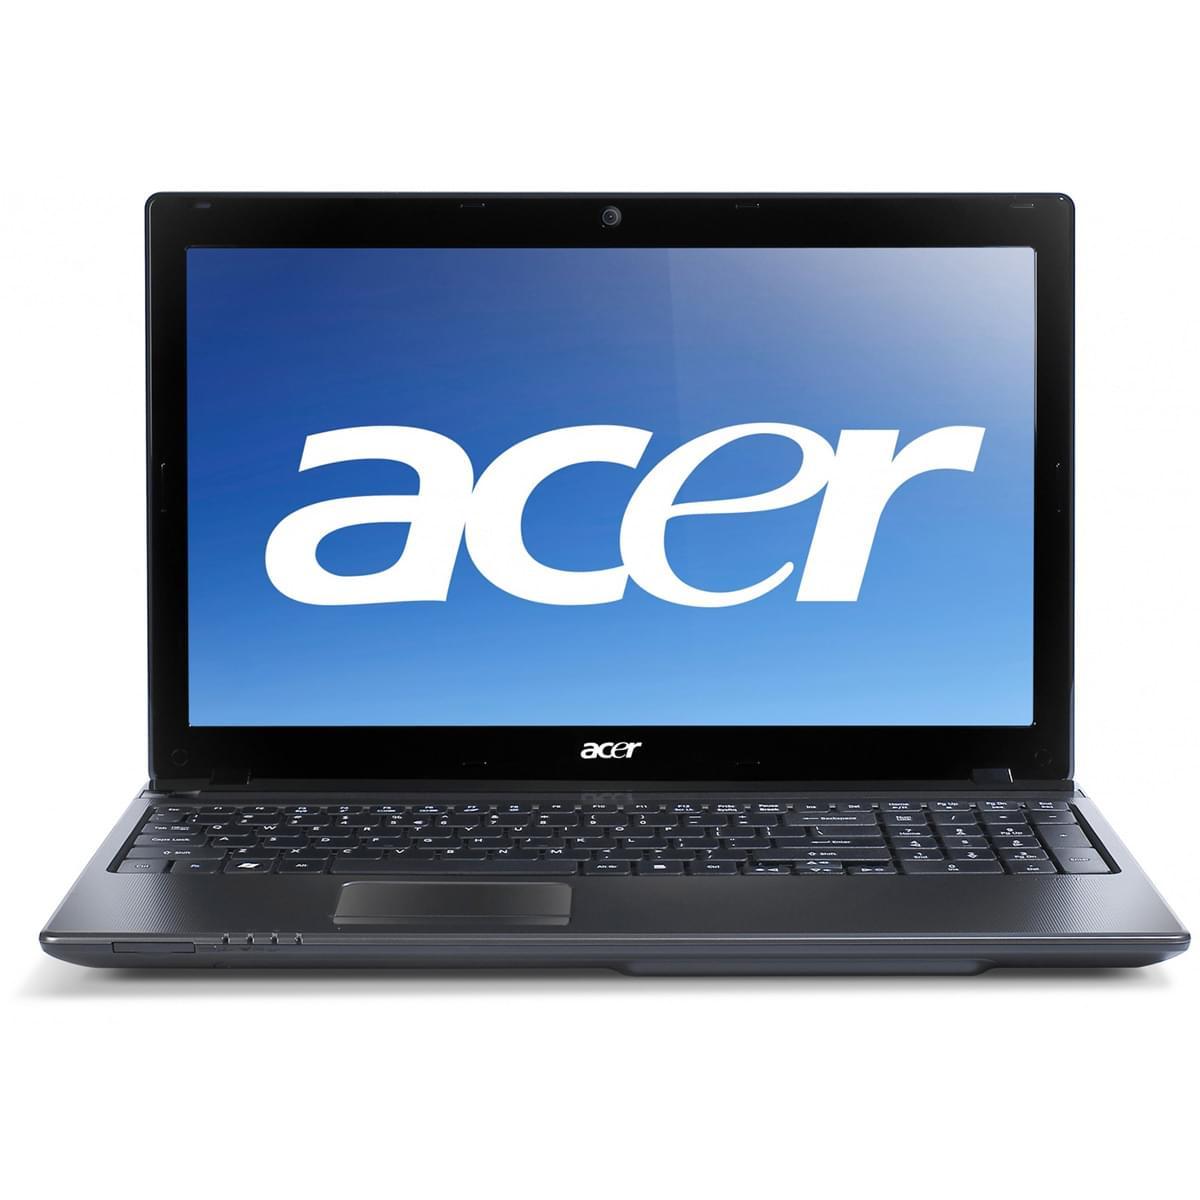 Acer LX.RPX02.025 soldé - PC portable Acer - Cybertek.fr - 0